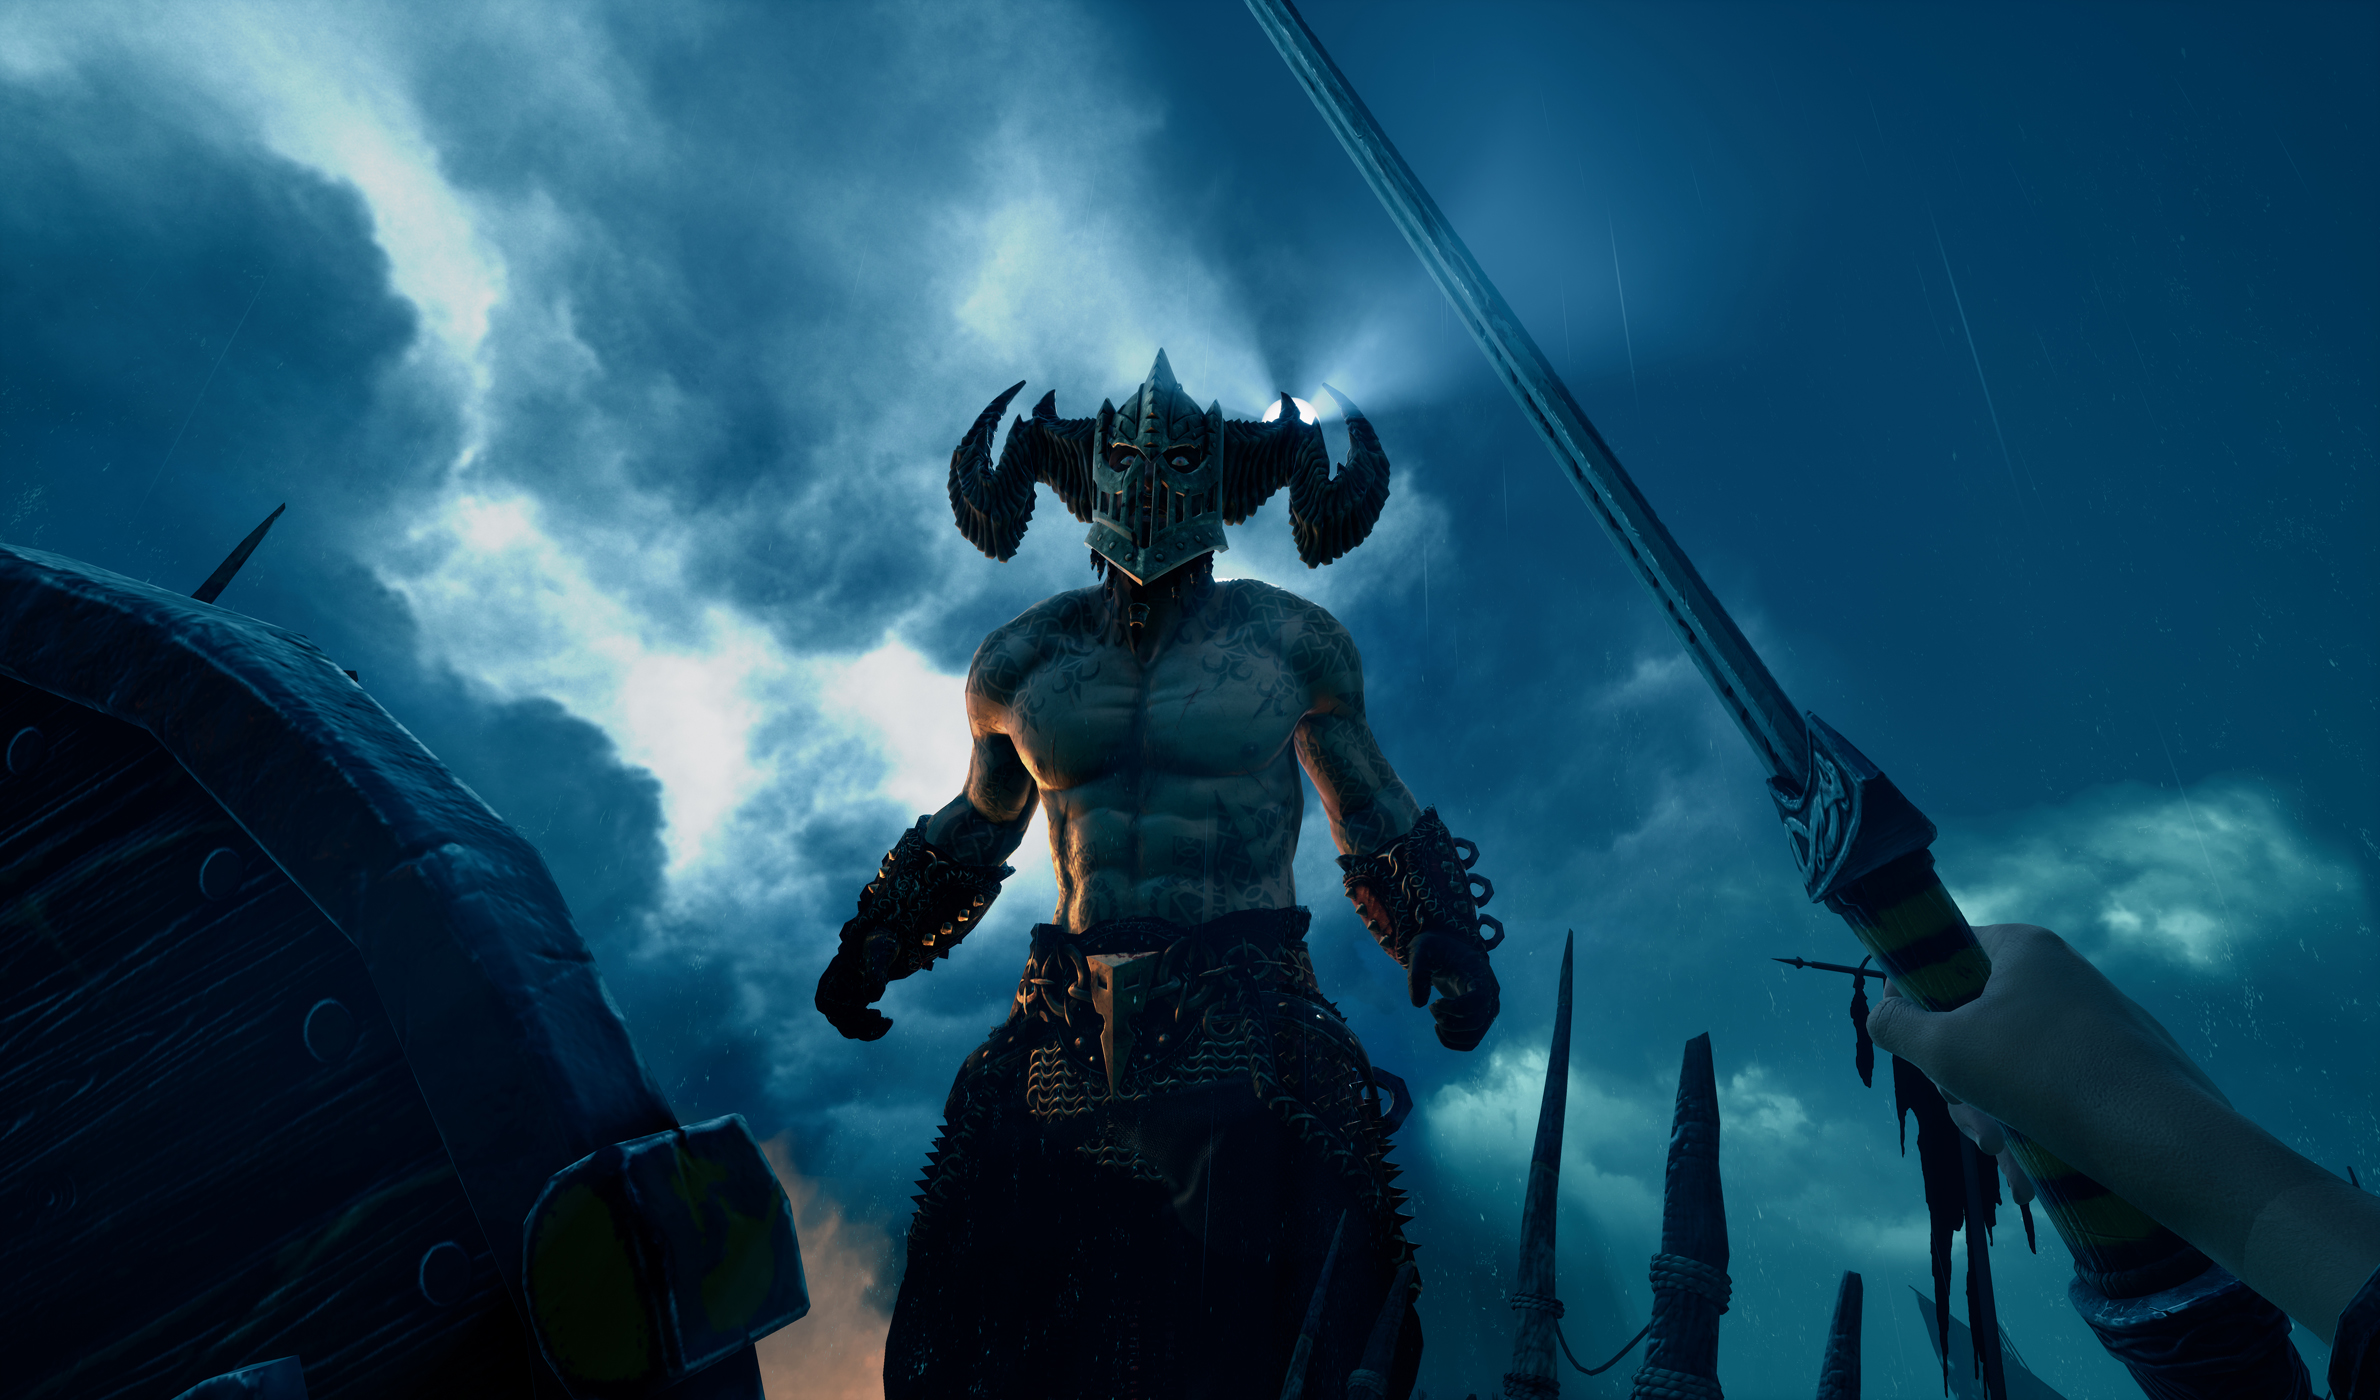 Asguard's Wrath